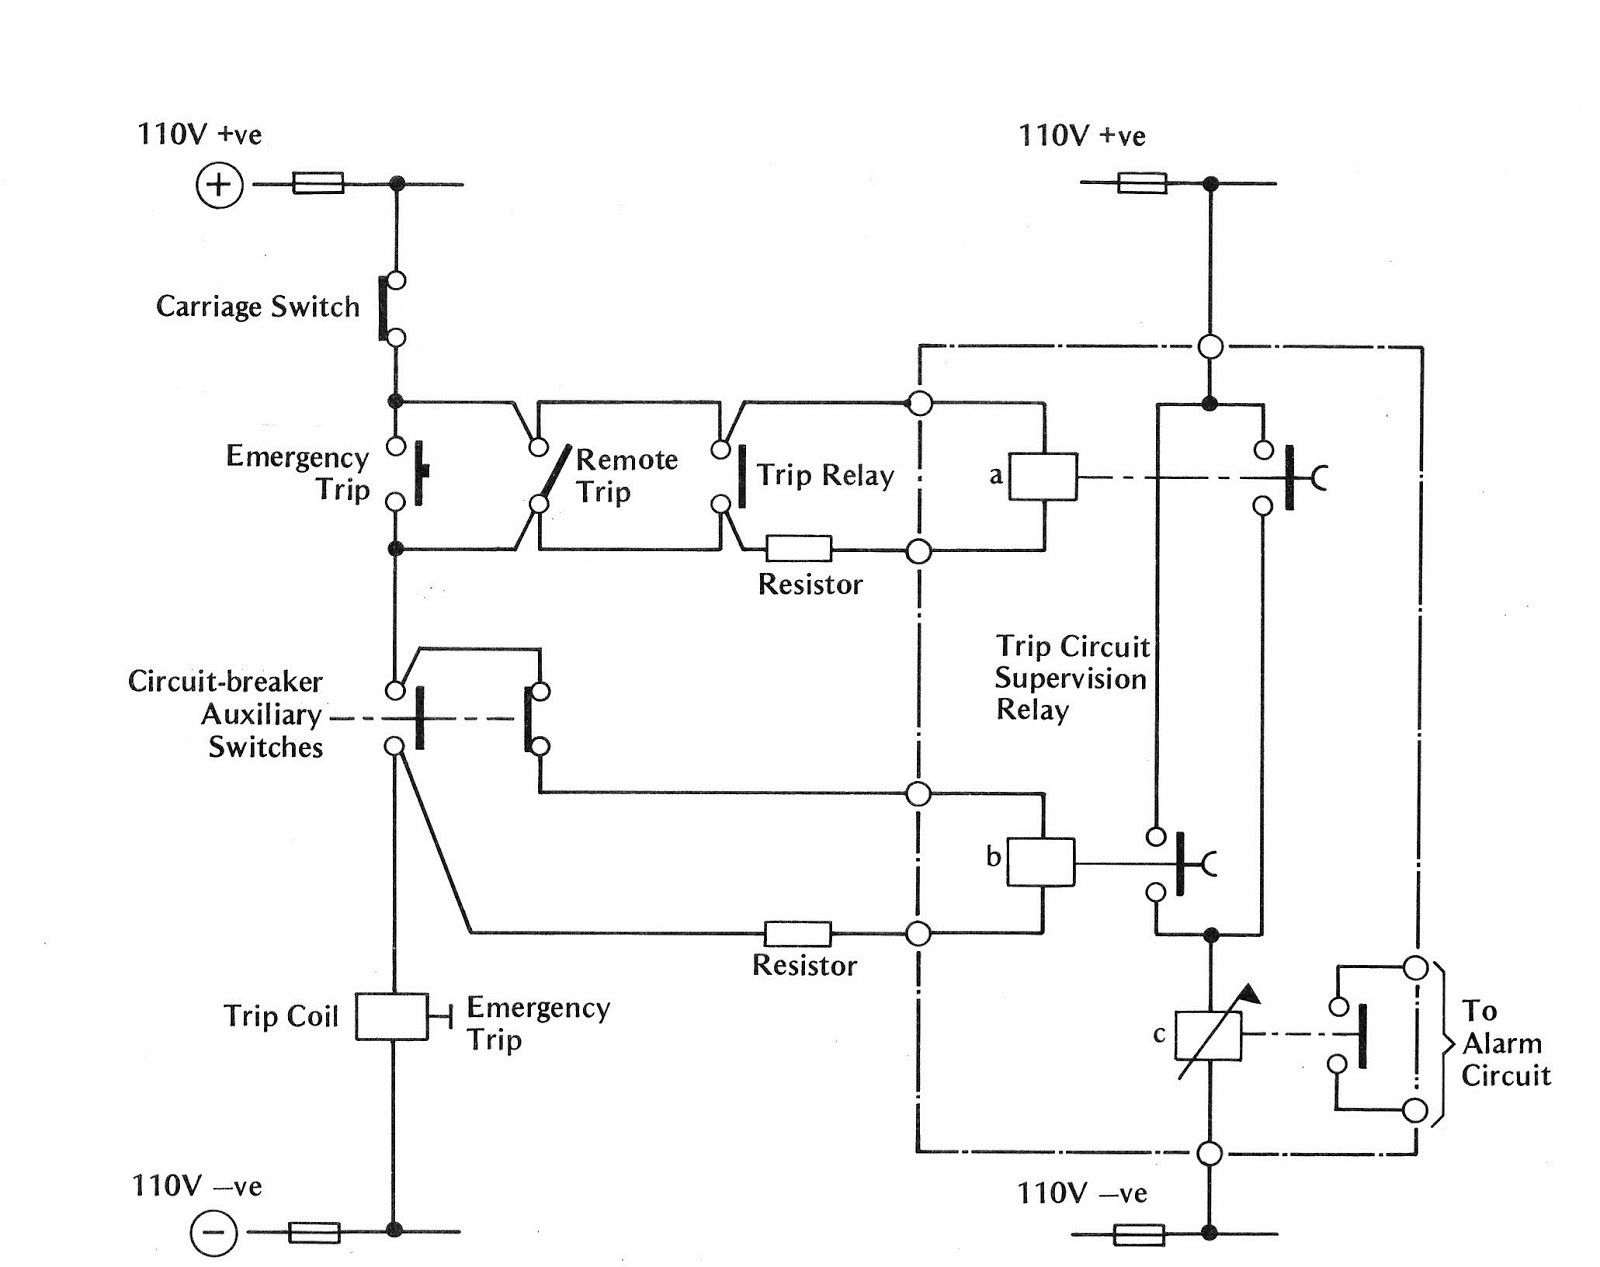 medium resolution of siemens gfci wiring diagram wiring diagram repair guides siemens breaker wiring diagram schema wiring diagramcircuit breaker